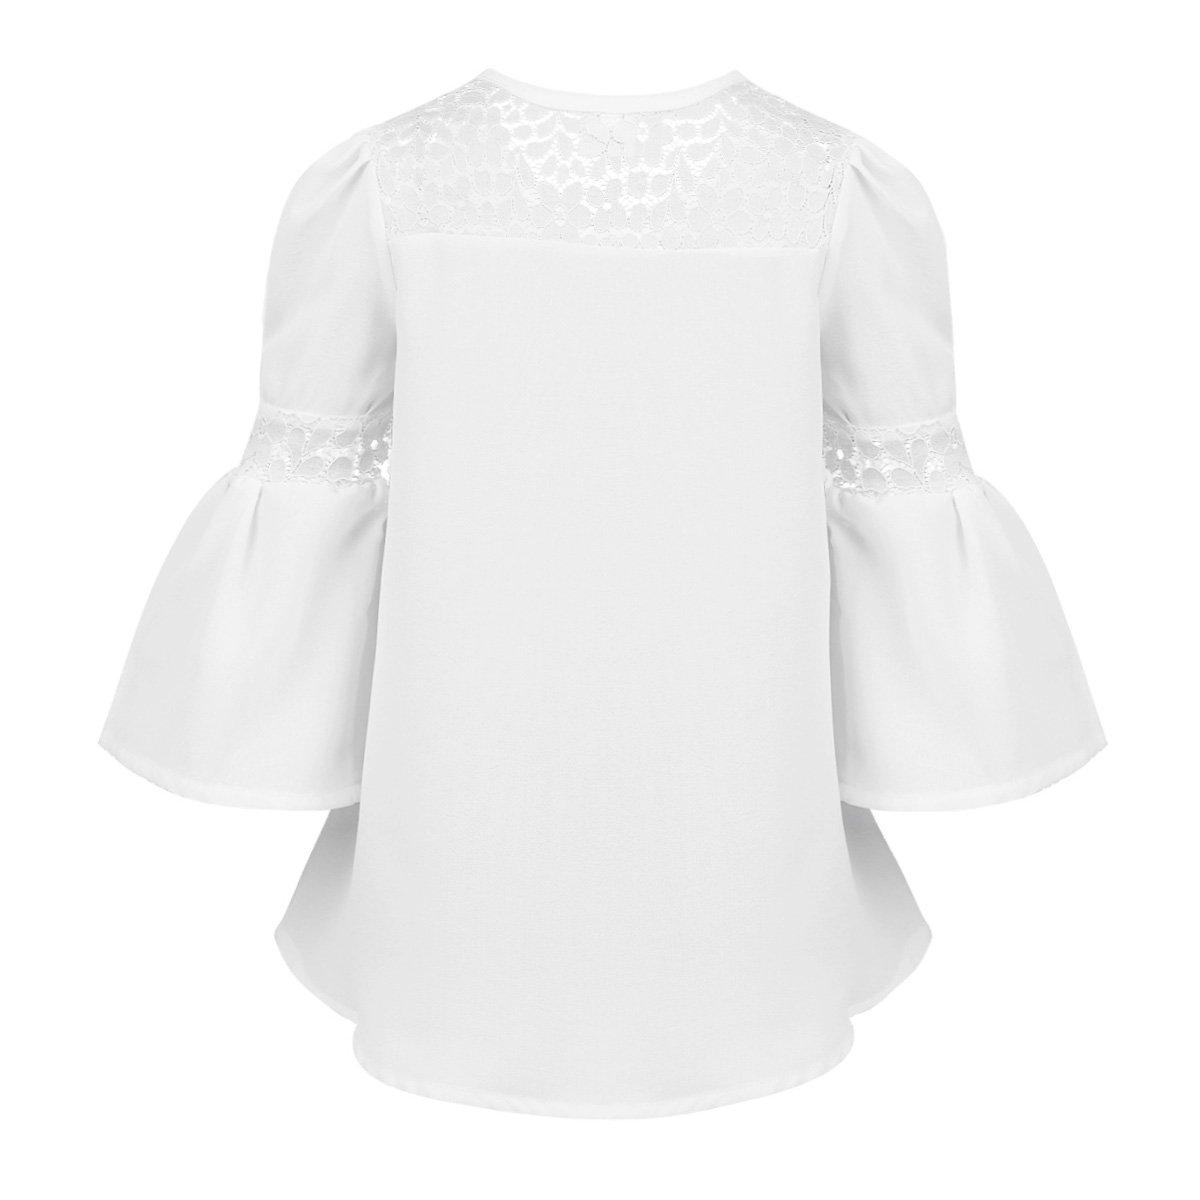 01d74db37 Freebily Blusa Camiseta para Niñas Camisa de Encaje Gasa para la Primavera,  Otoño, Verano (4-16 Años)